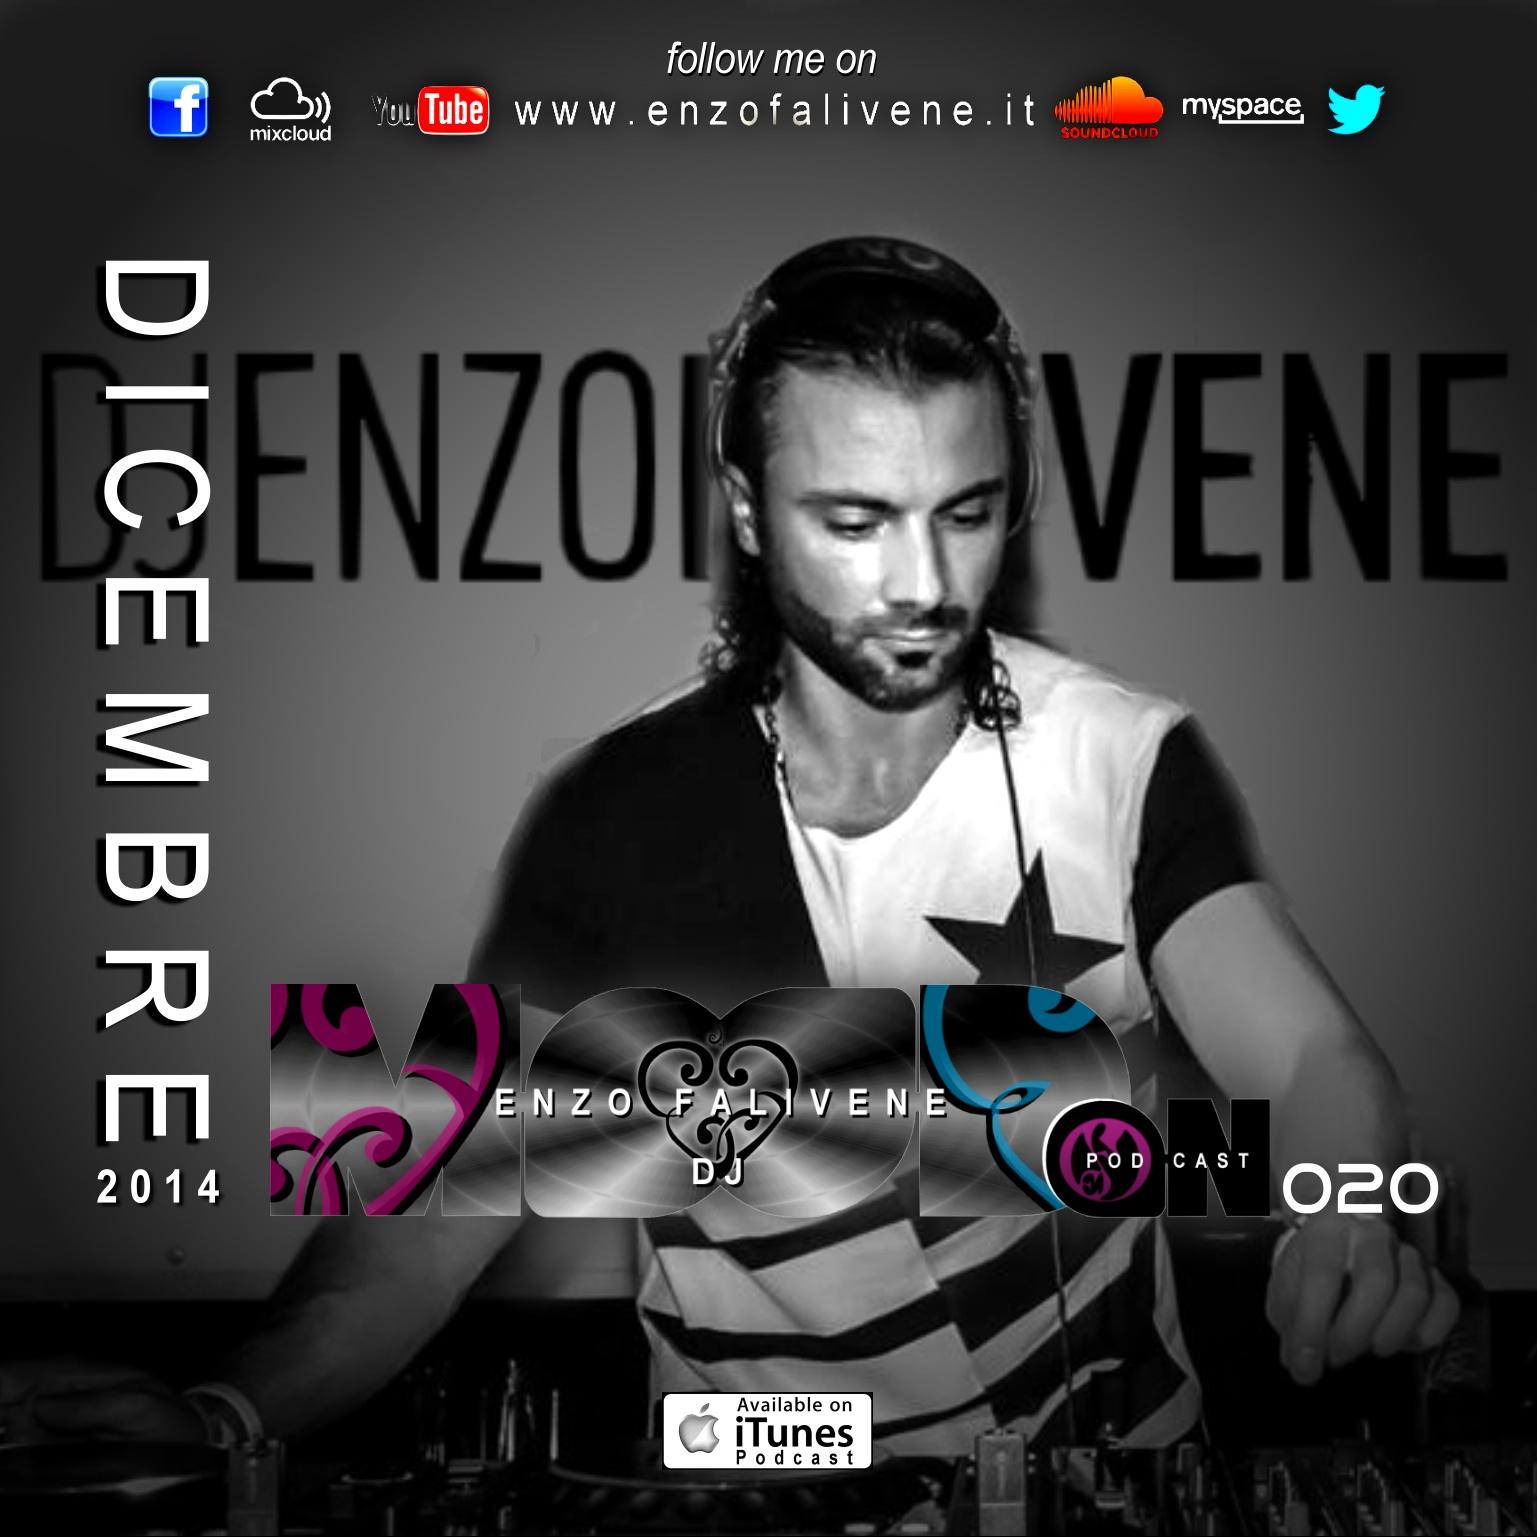 Dj Enzo Falivene - Mood On 020 Dicembre 2014